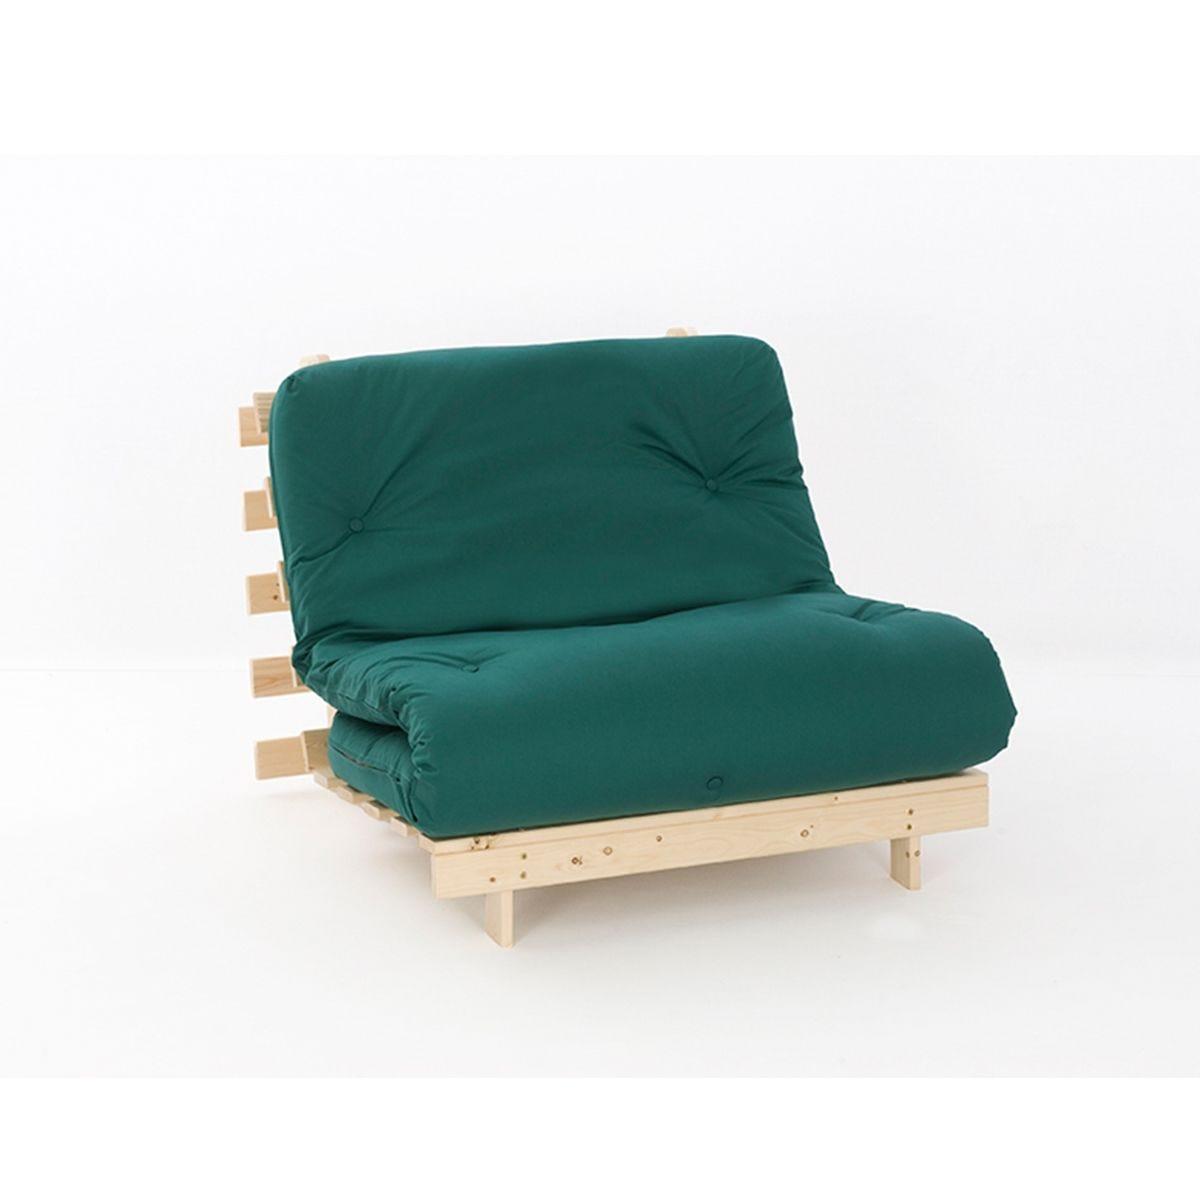 Ayr Futon Set With Tufted Mattress - Green